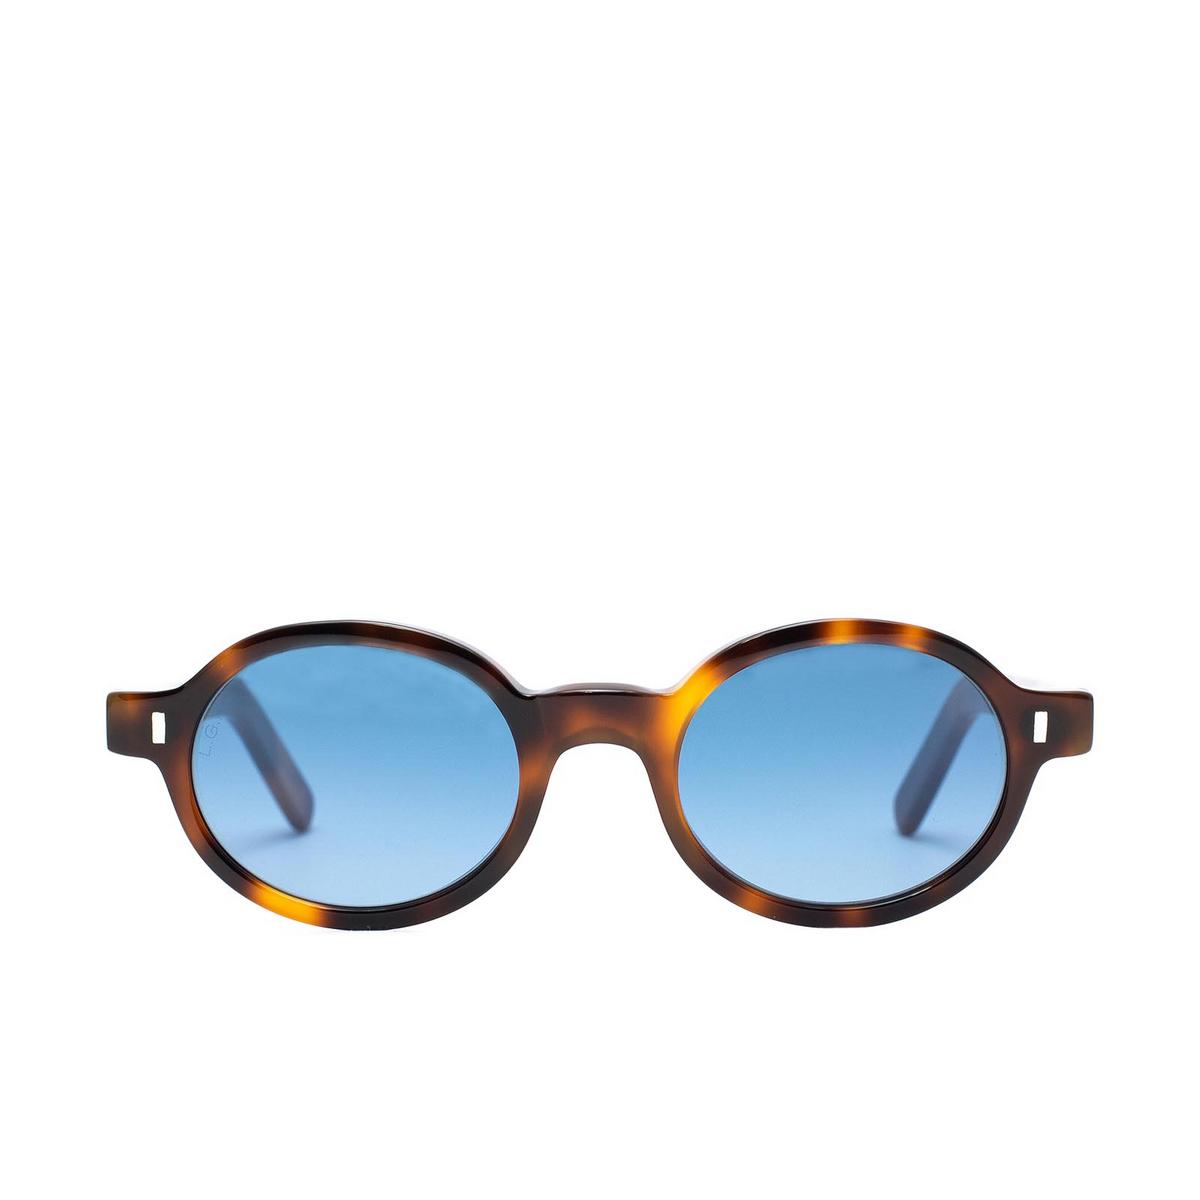 L.G.R® Oval Sunglasses: Teos Bold color Havana 39.